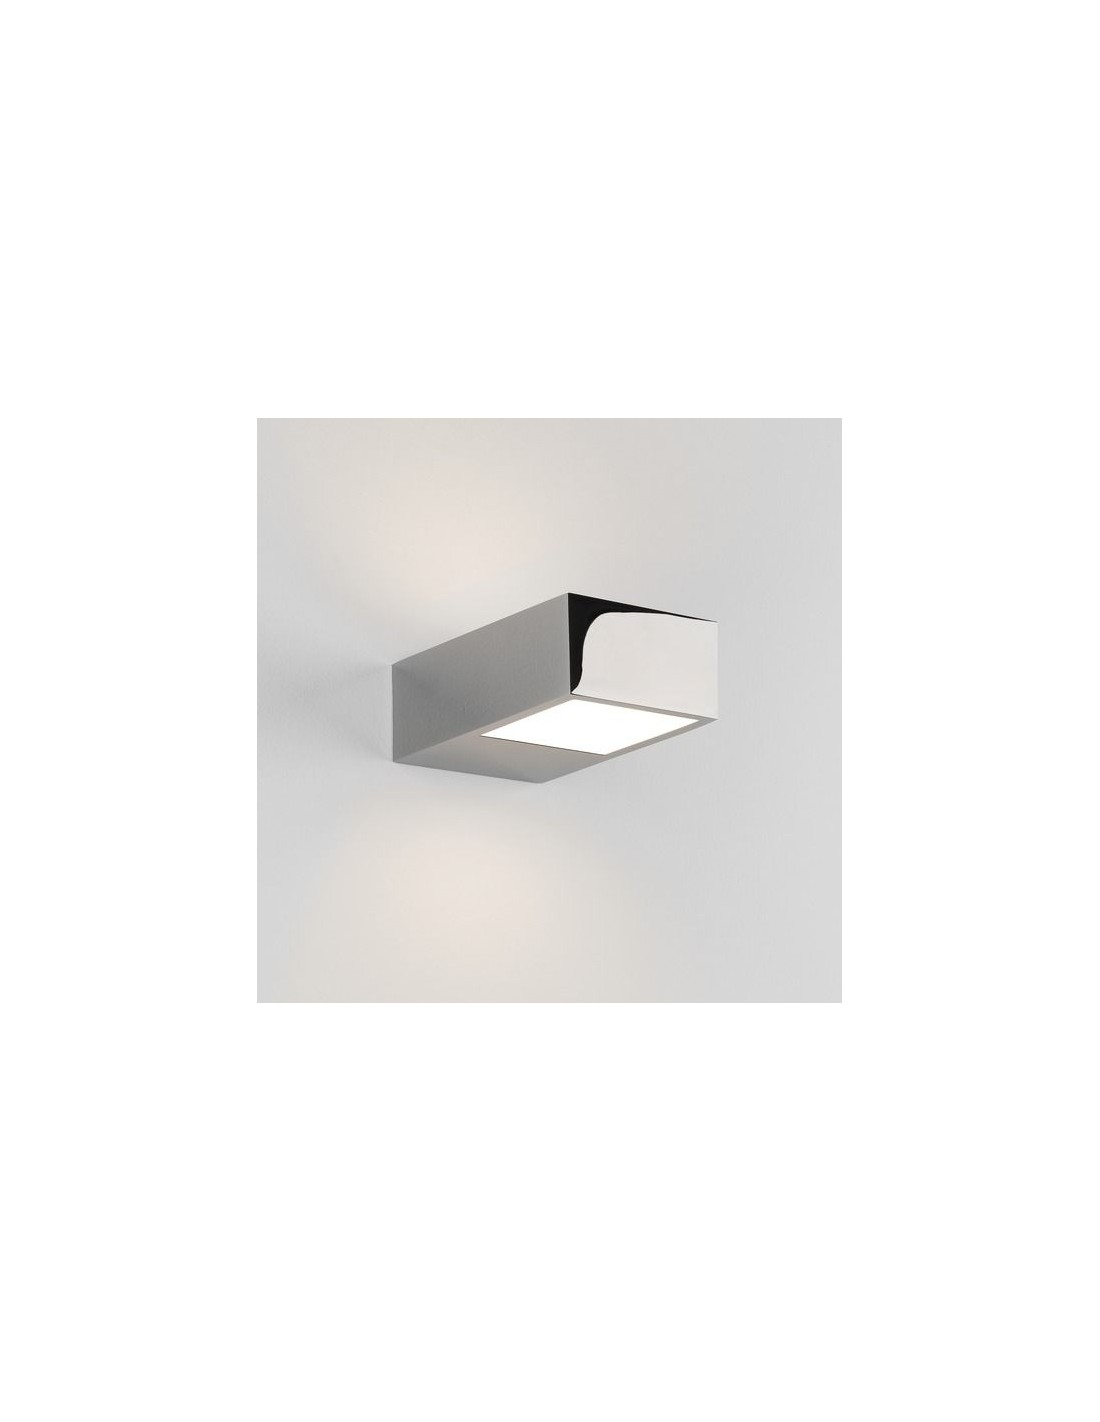 Gros plan applique kappa LED chrome Astro Lighting Valente Design